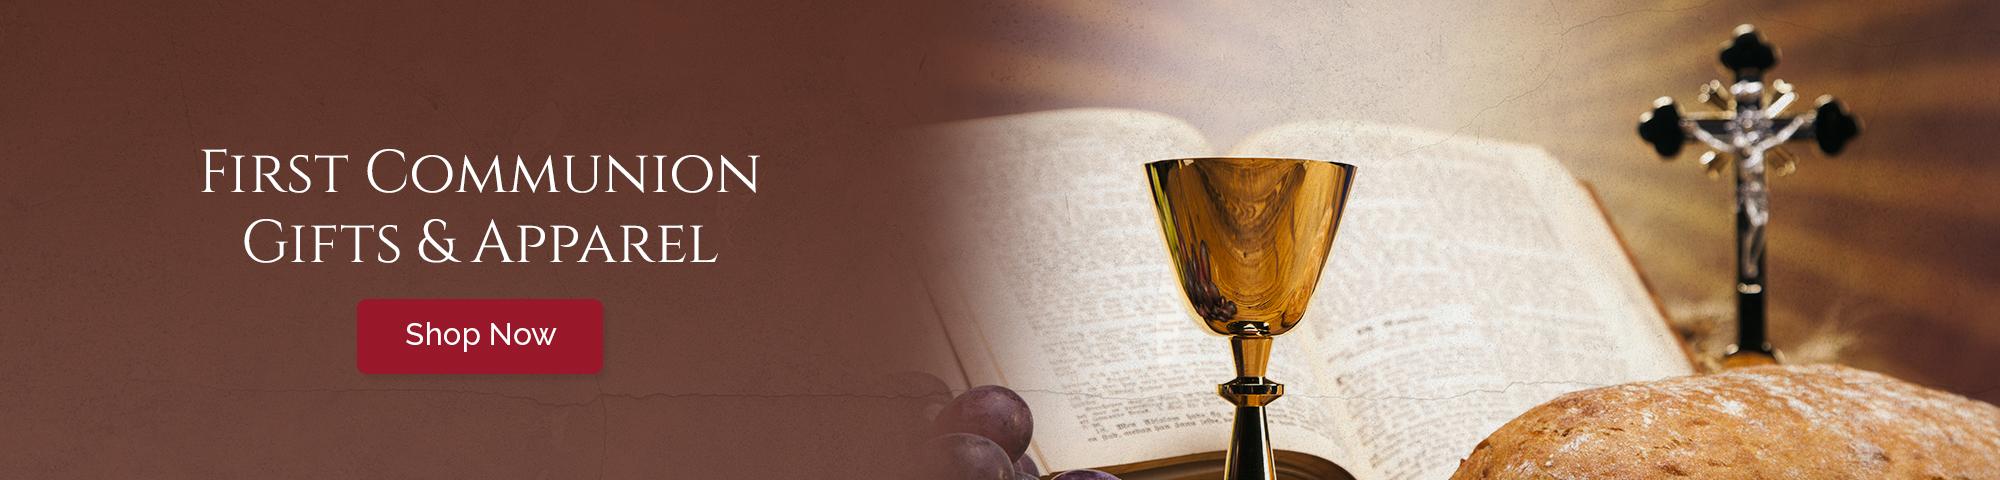 Religious Articles Catholic Church Supplies Religious Items - Religious articles